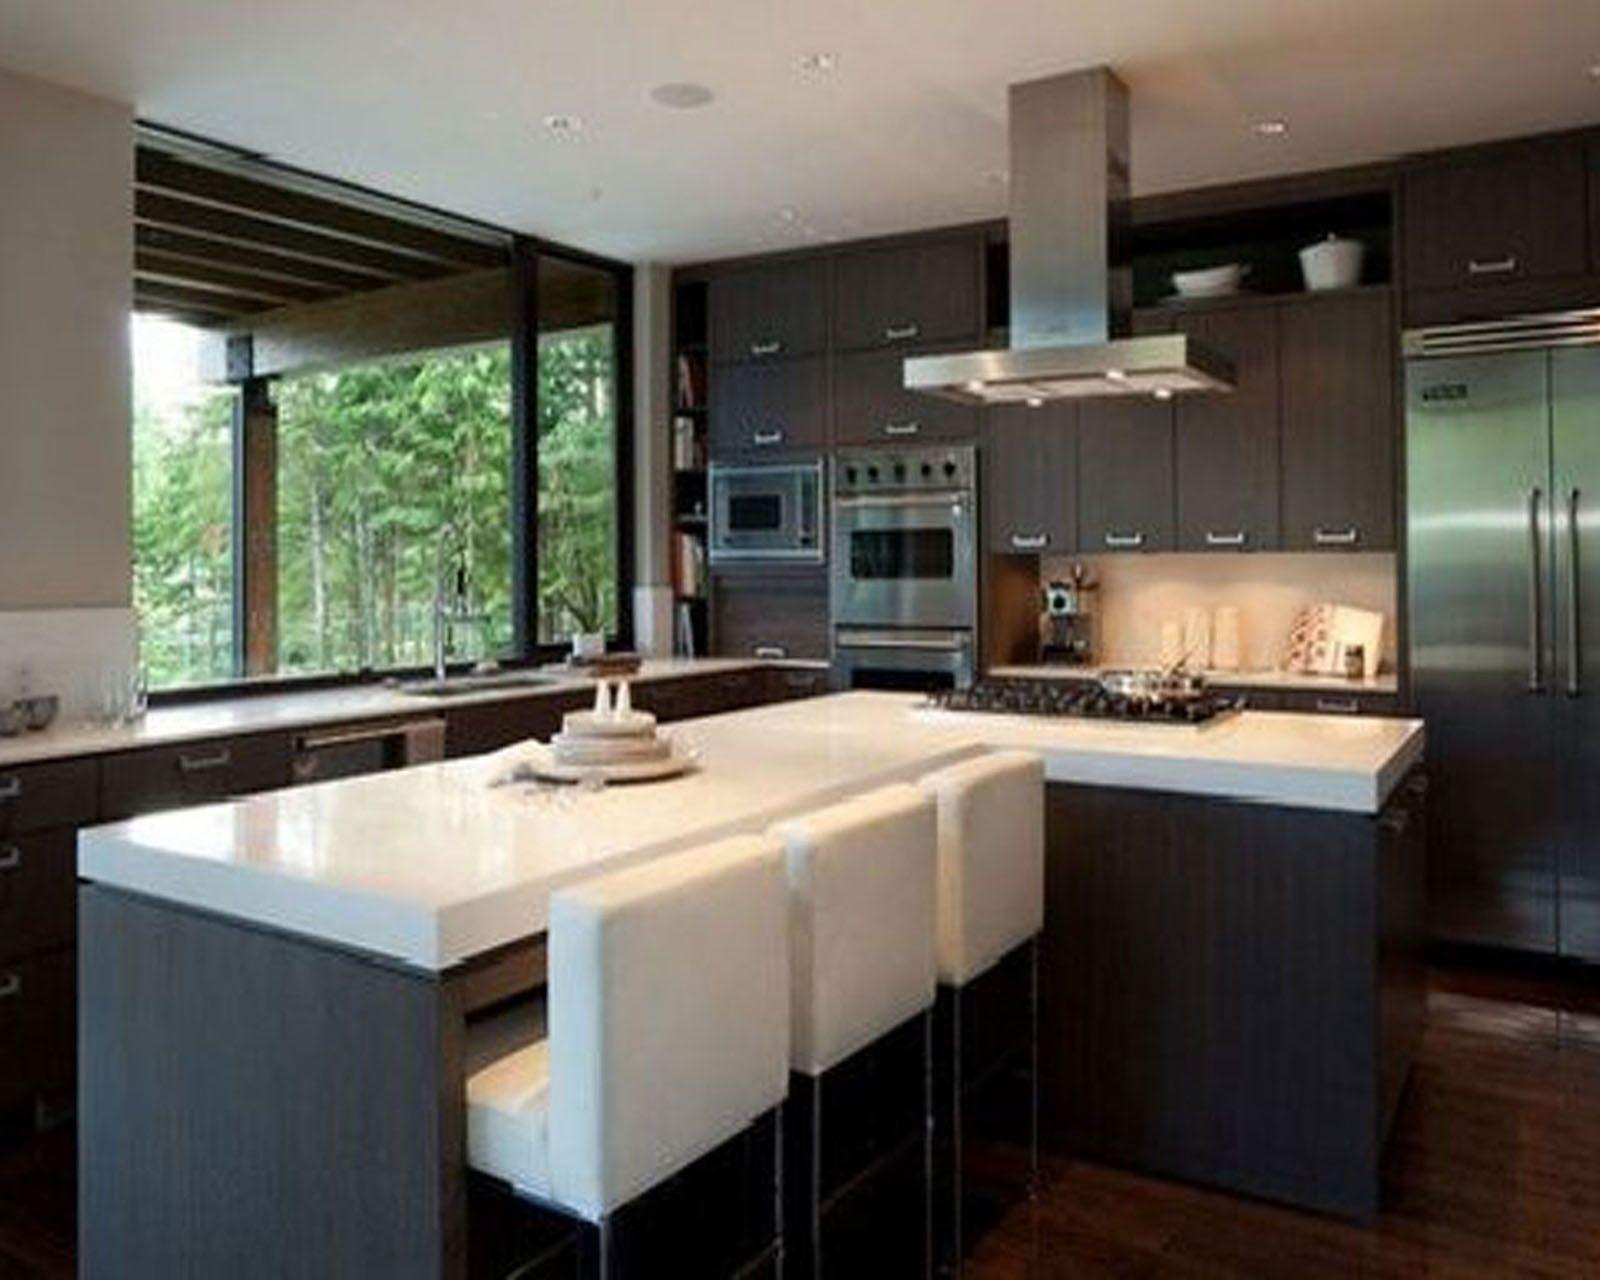 small-kitchen-design-ideas-ikea.jpg 1,600×1,280 pixels | The Modern ...